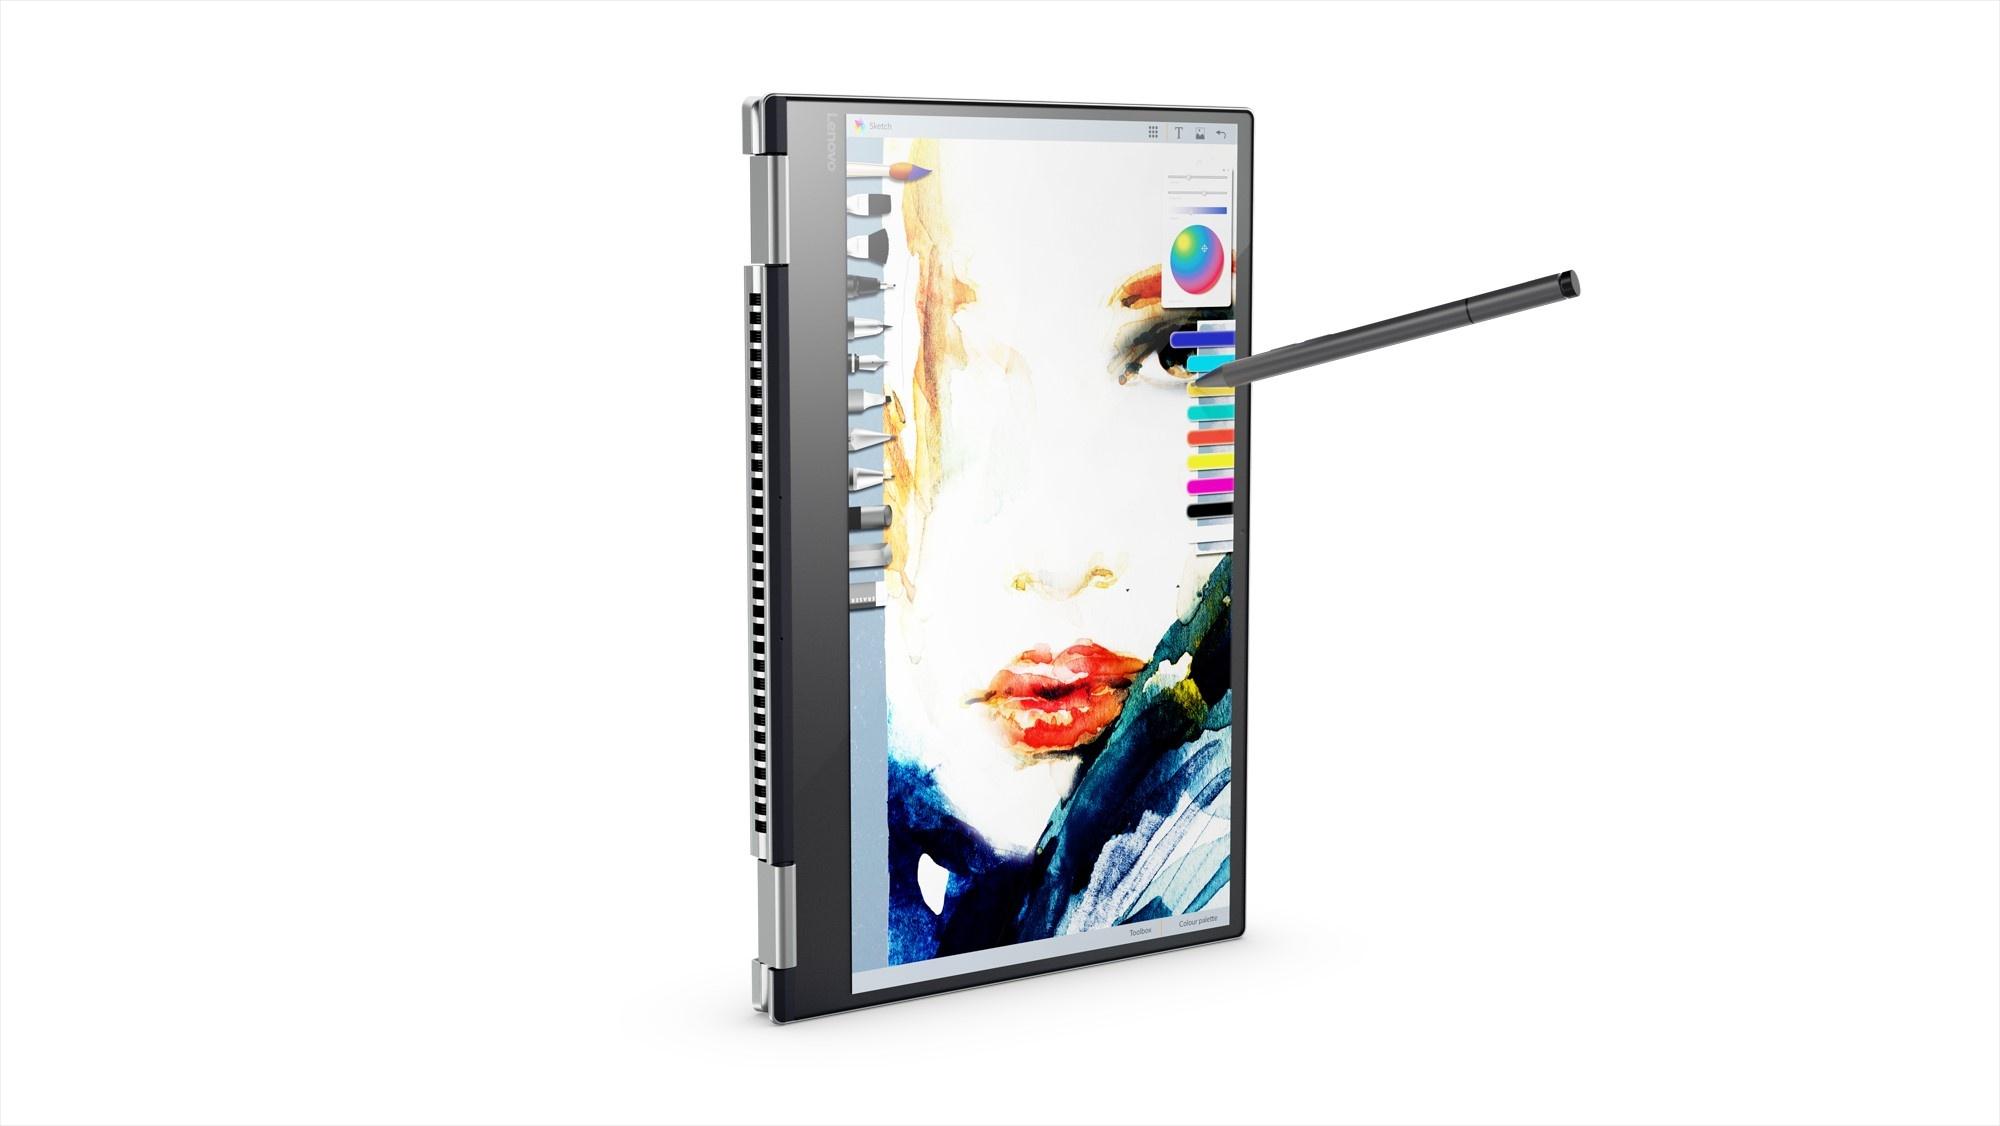 Lenovo Yoga 720 & 520 Design